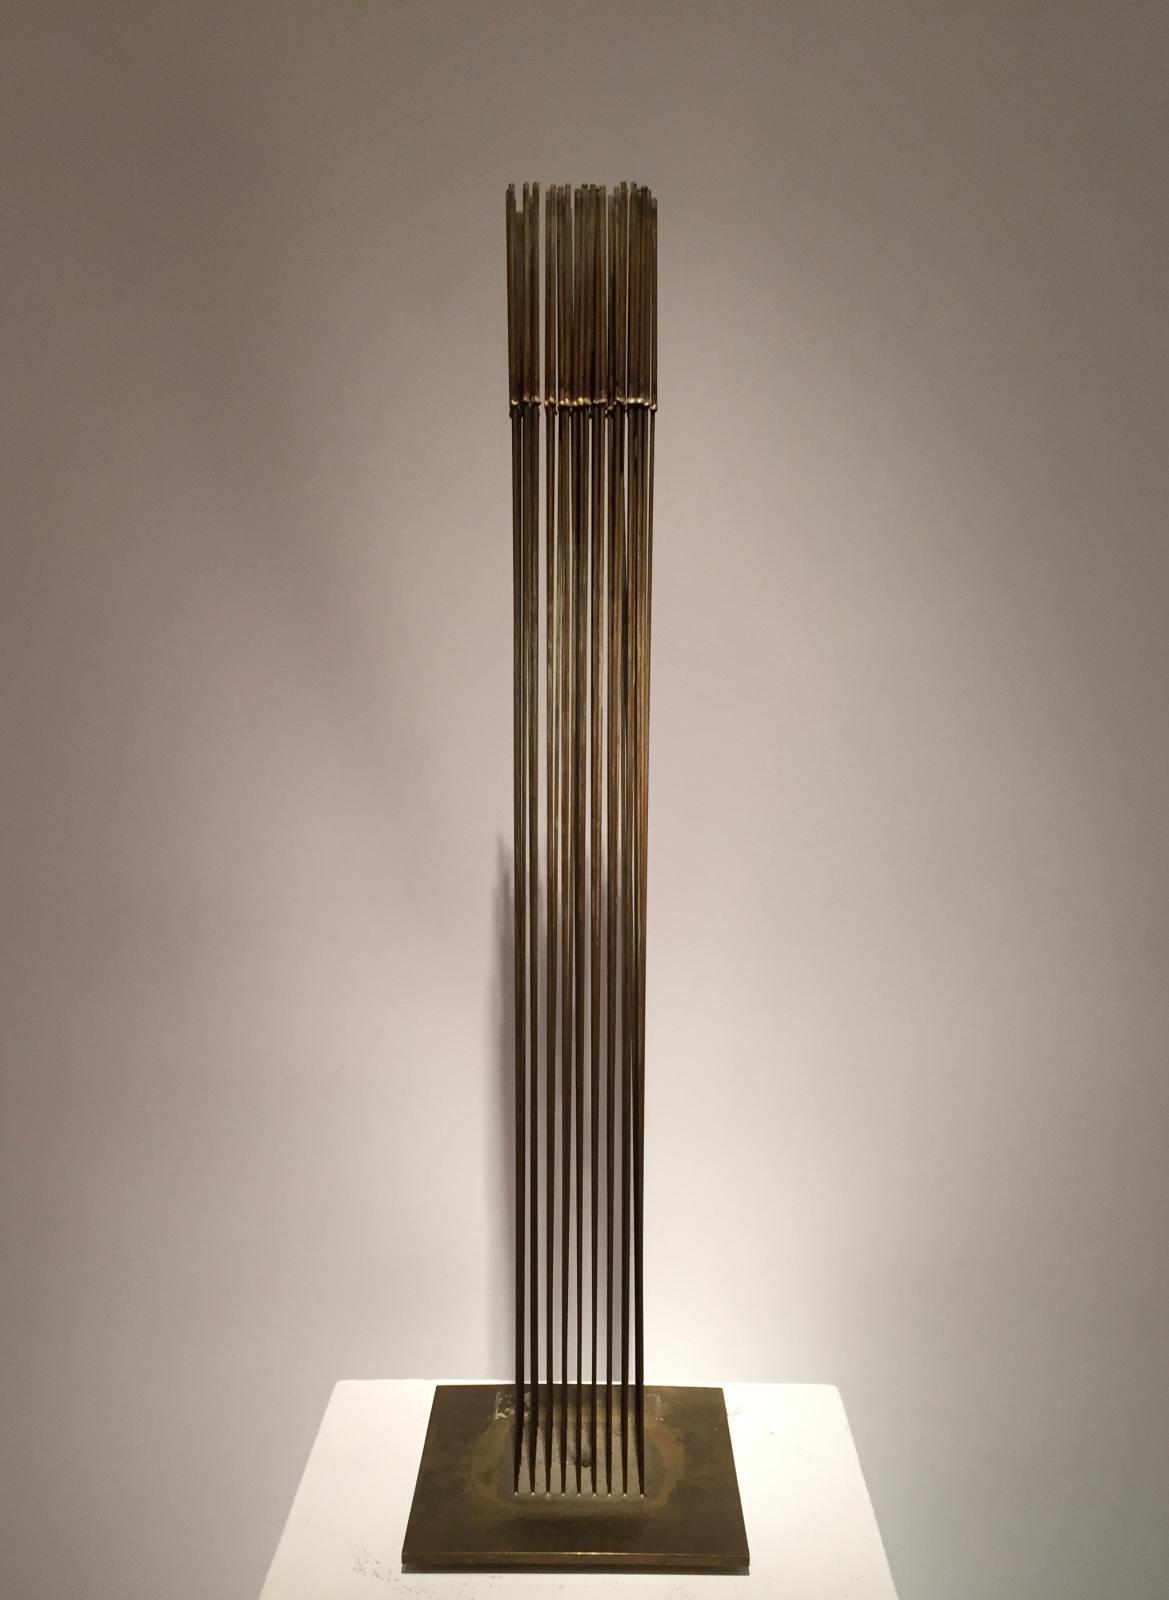 Harry Bertoia, Untitled, Circa 1970